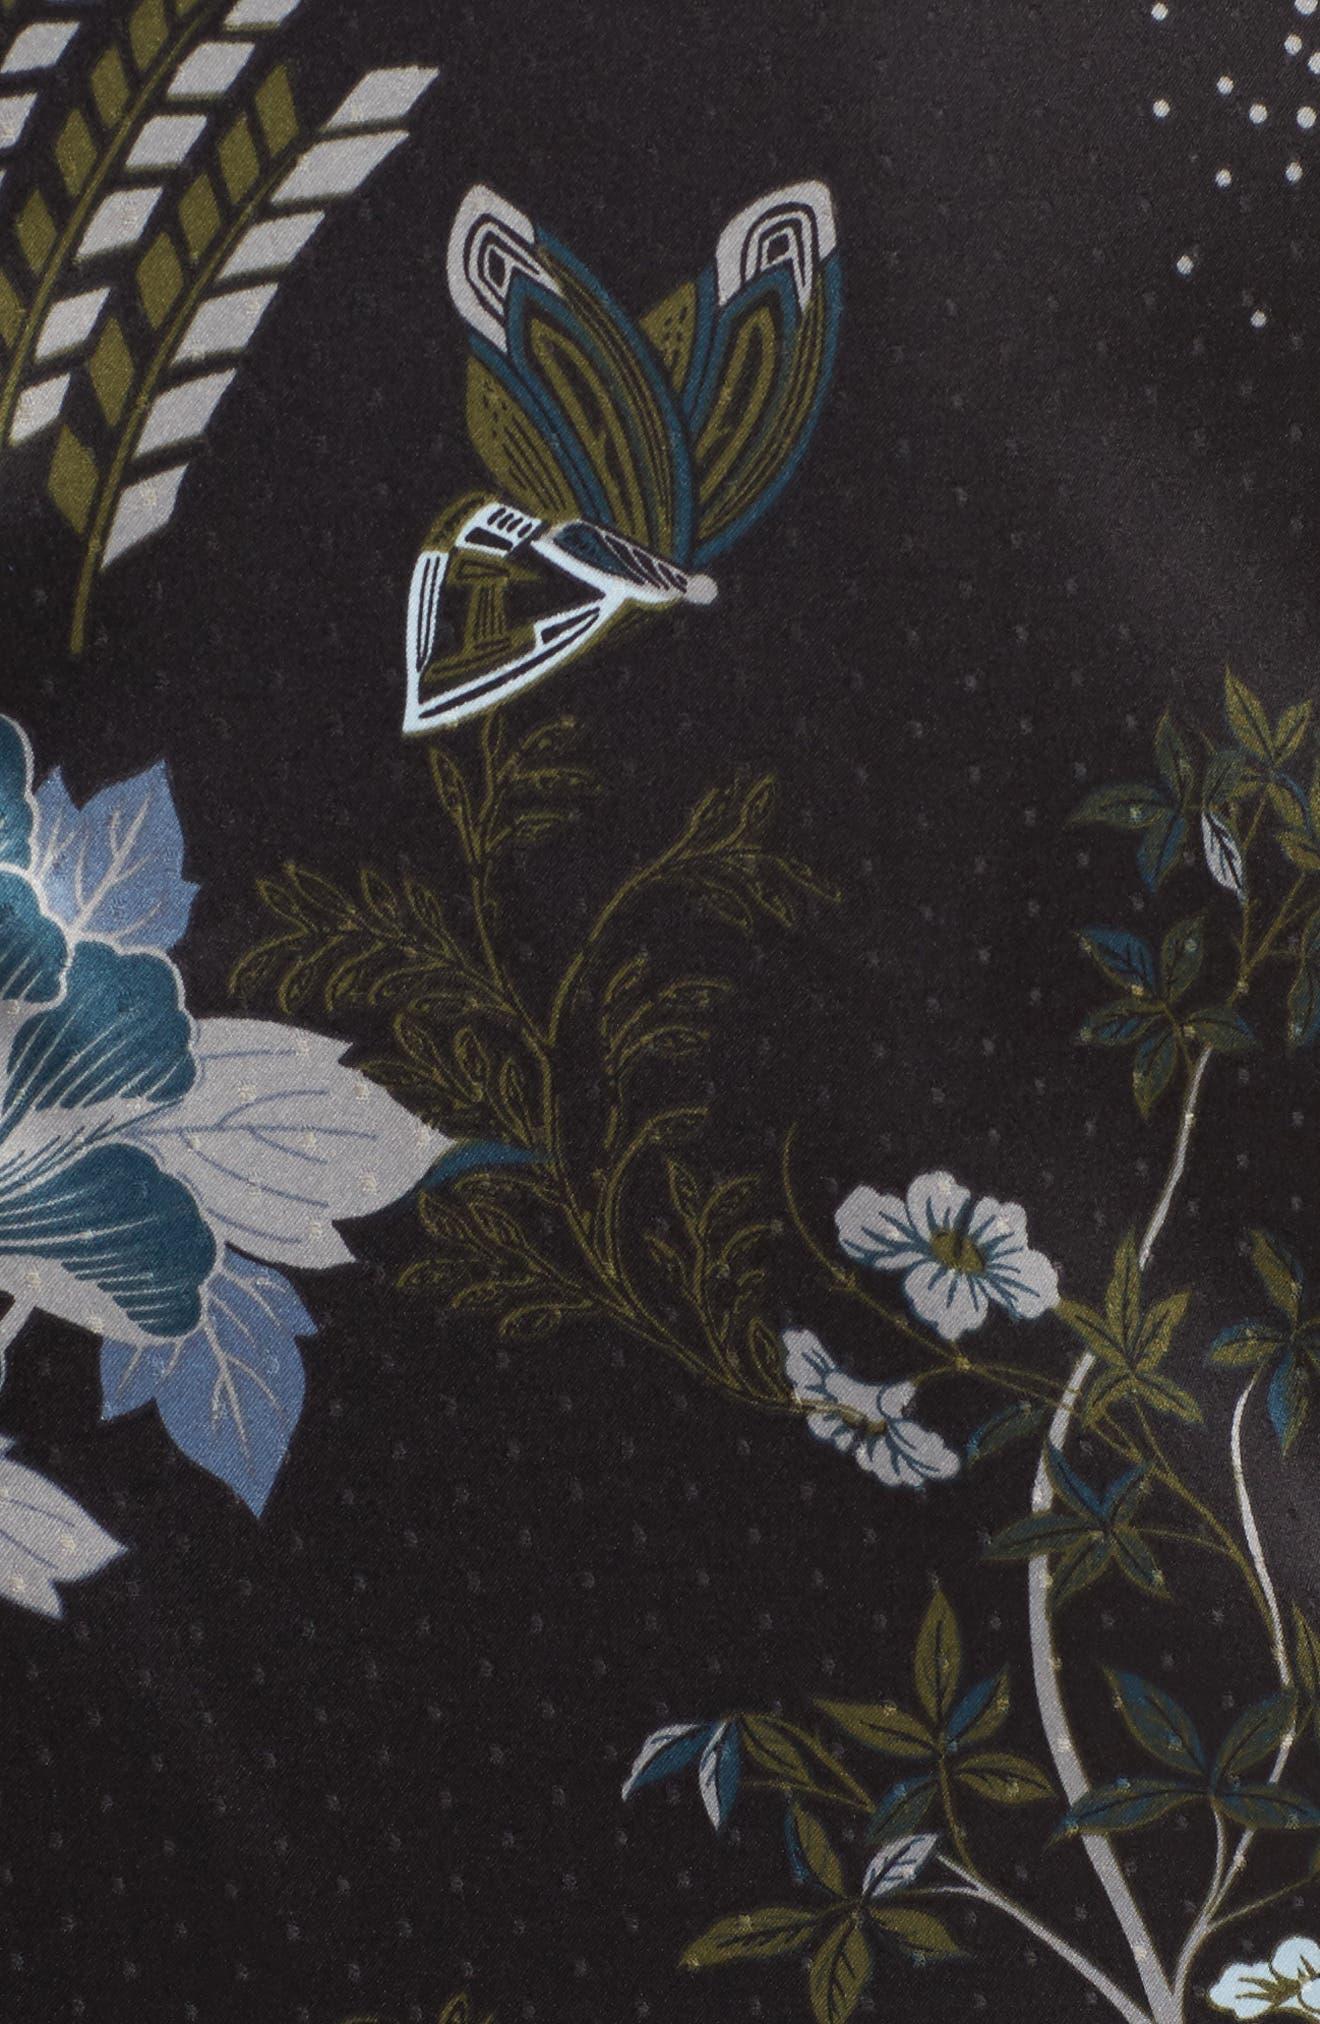 Late Nights Satin Midi Robe,                             Alternate thumbnail 5, color,                             Black Decorative Scenery